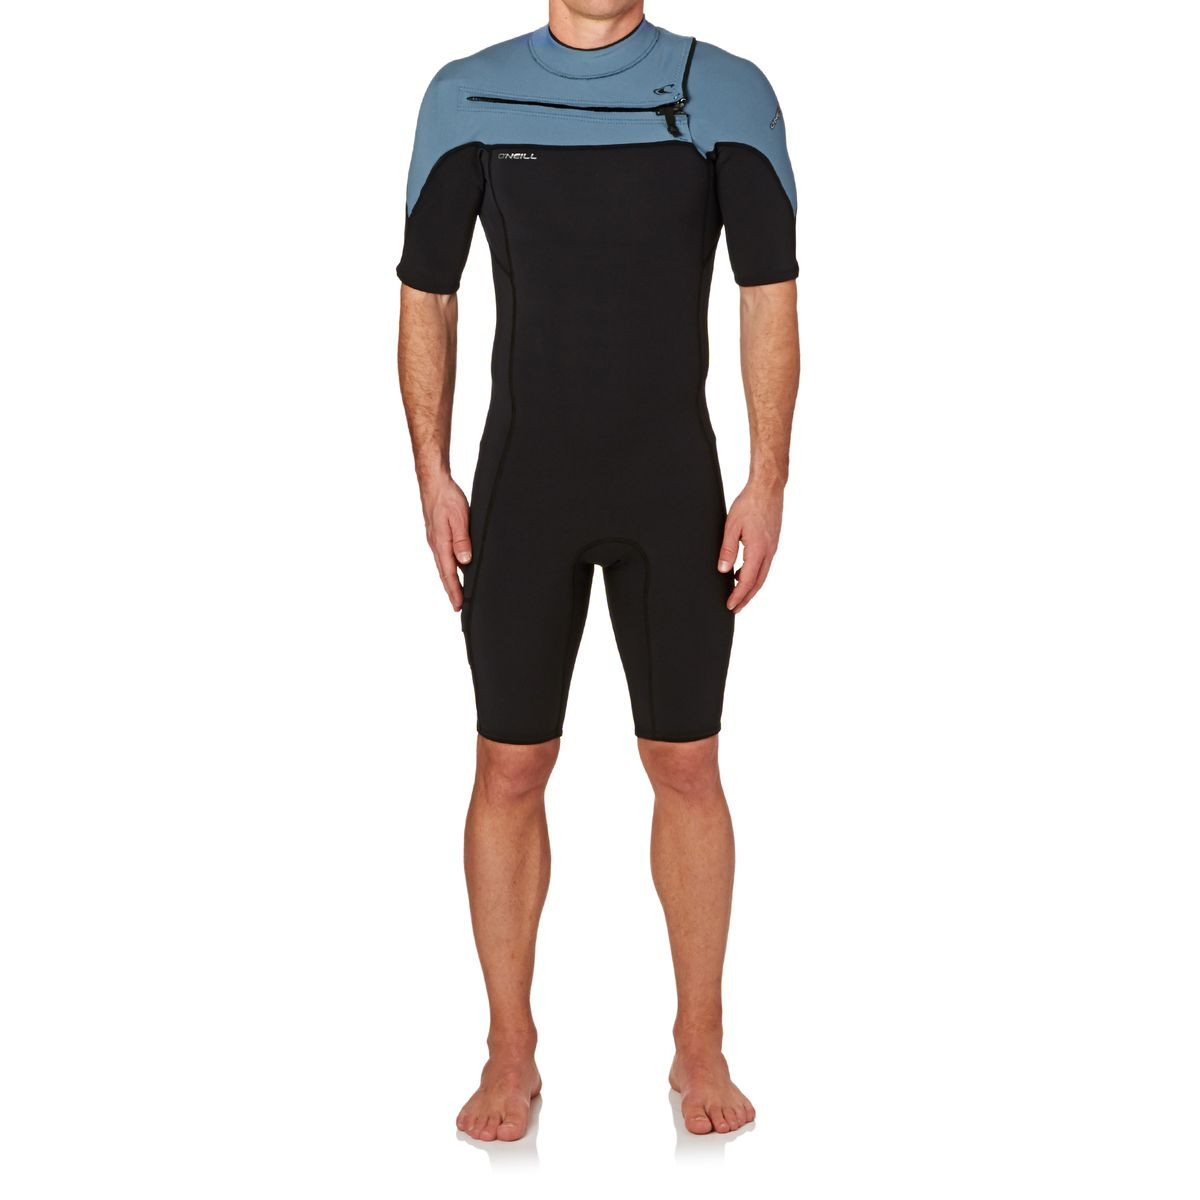 O'Neill Hammer 2mm 2017 Chest Zip Short Sleeve Shorty Wetsuit - Black/ Black/ Dusty Blue